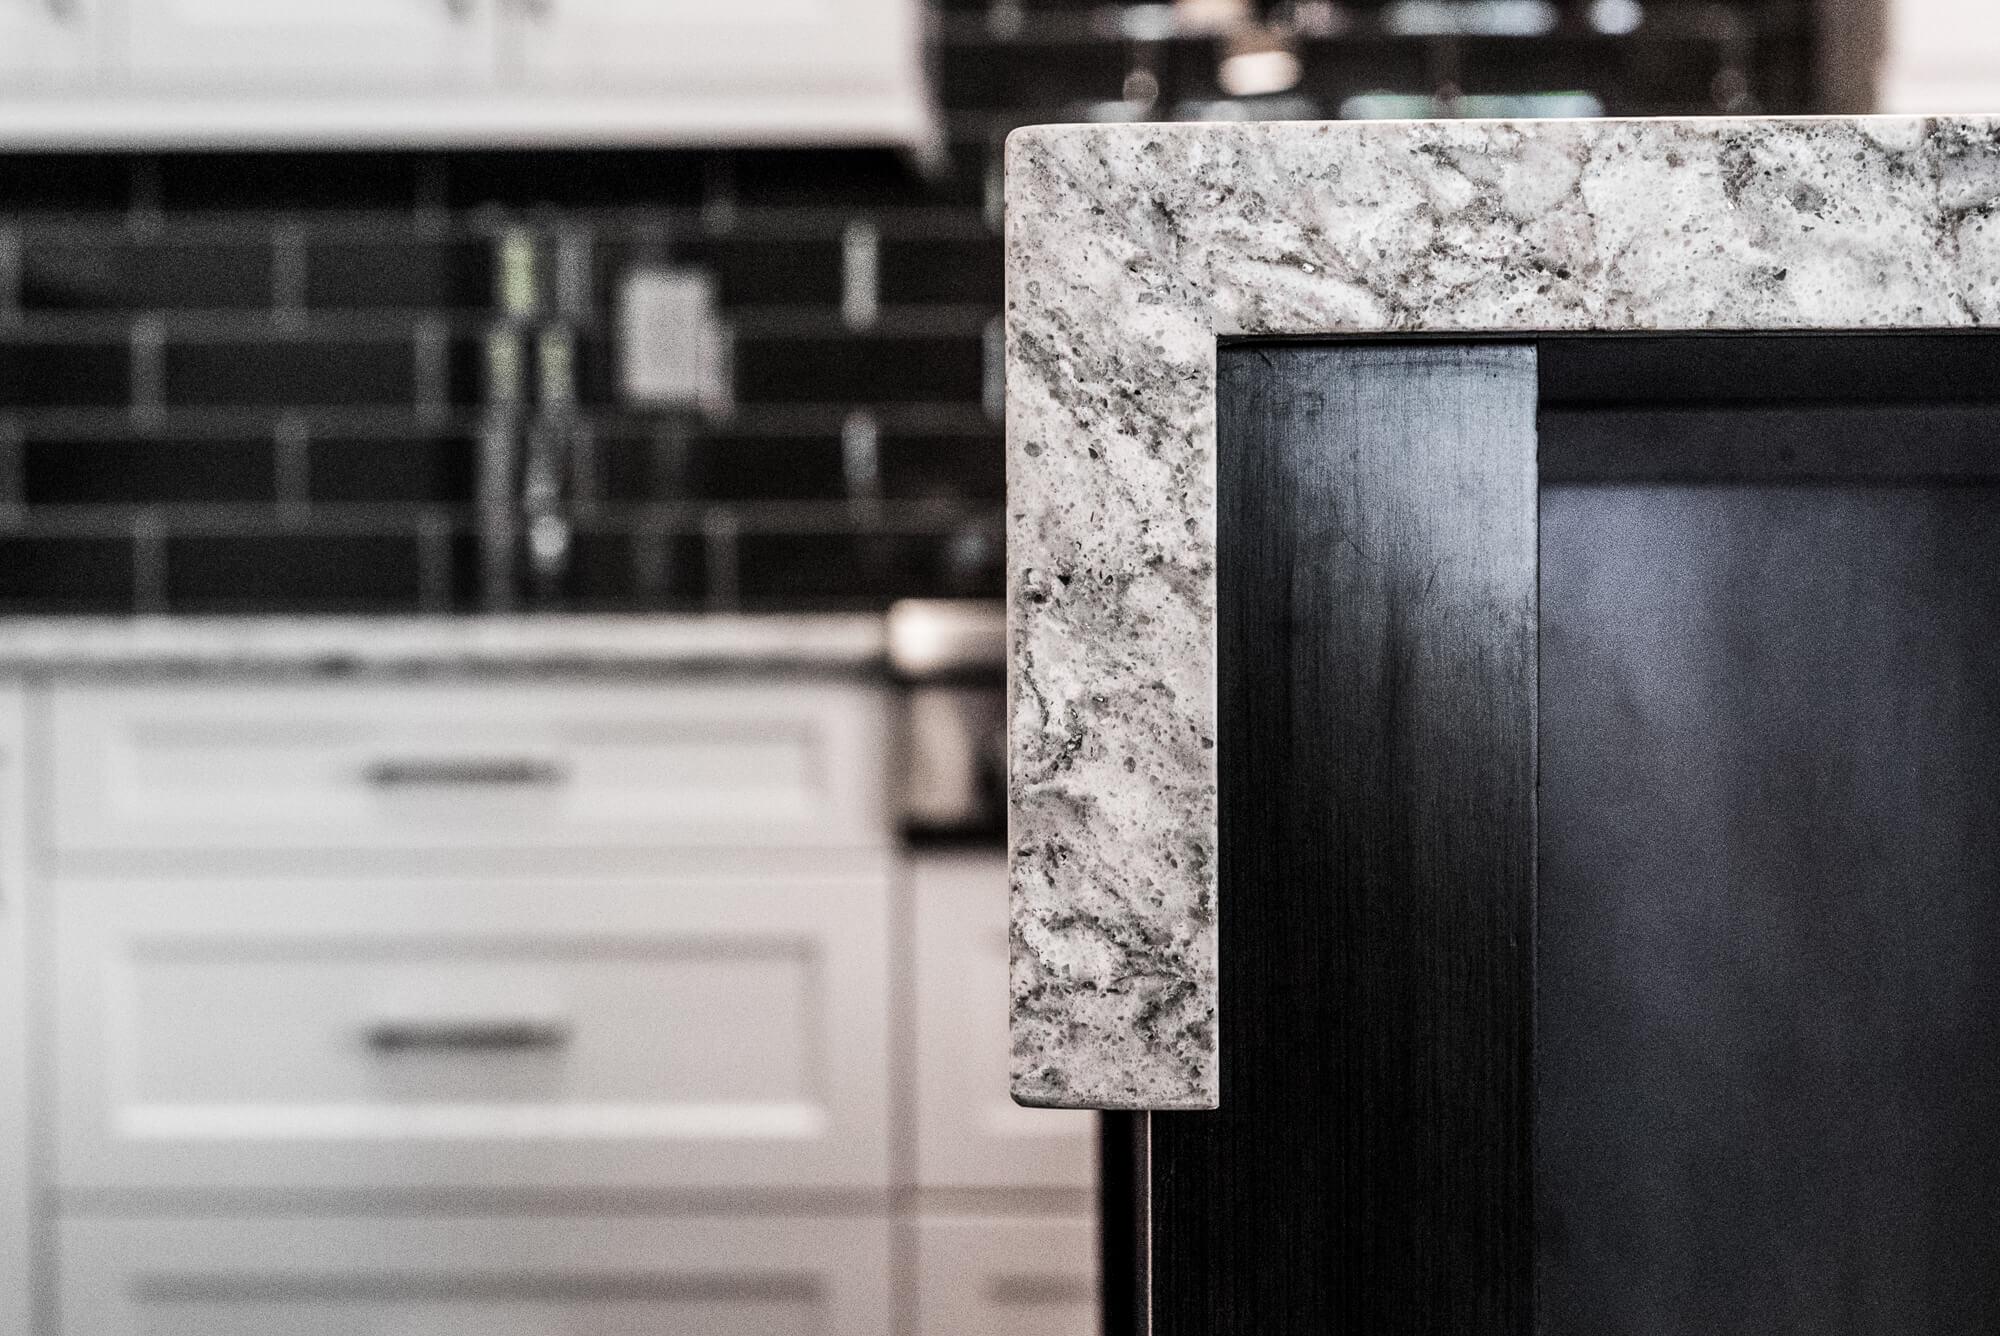 Kitchen Counter Top Details, Half Waterfall Kitchen Counter Top, Custom Kitchen Counter Top Design